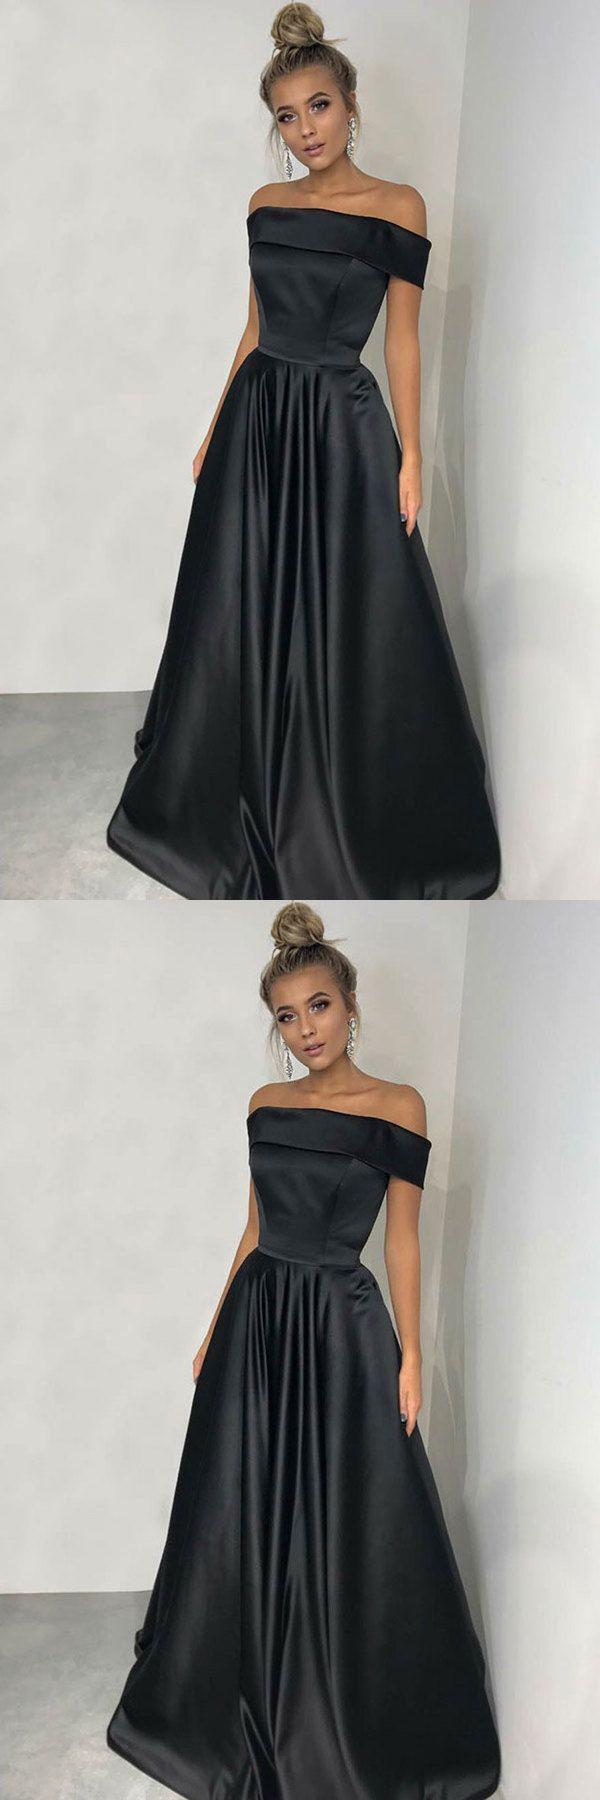 charming simple cheap elegant long black satin prom dresses